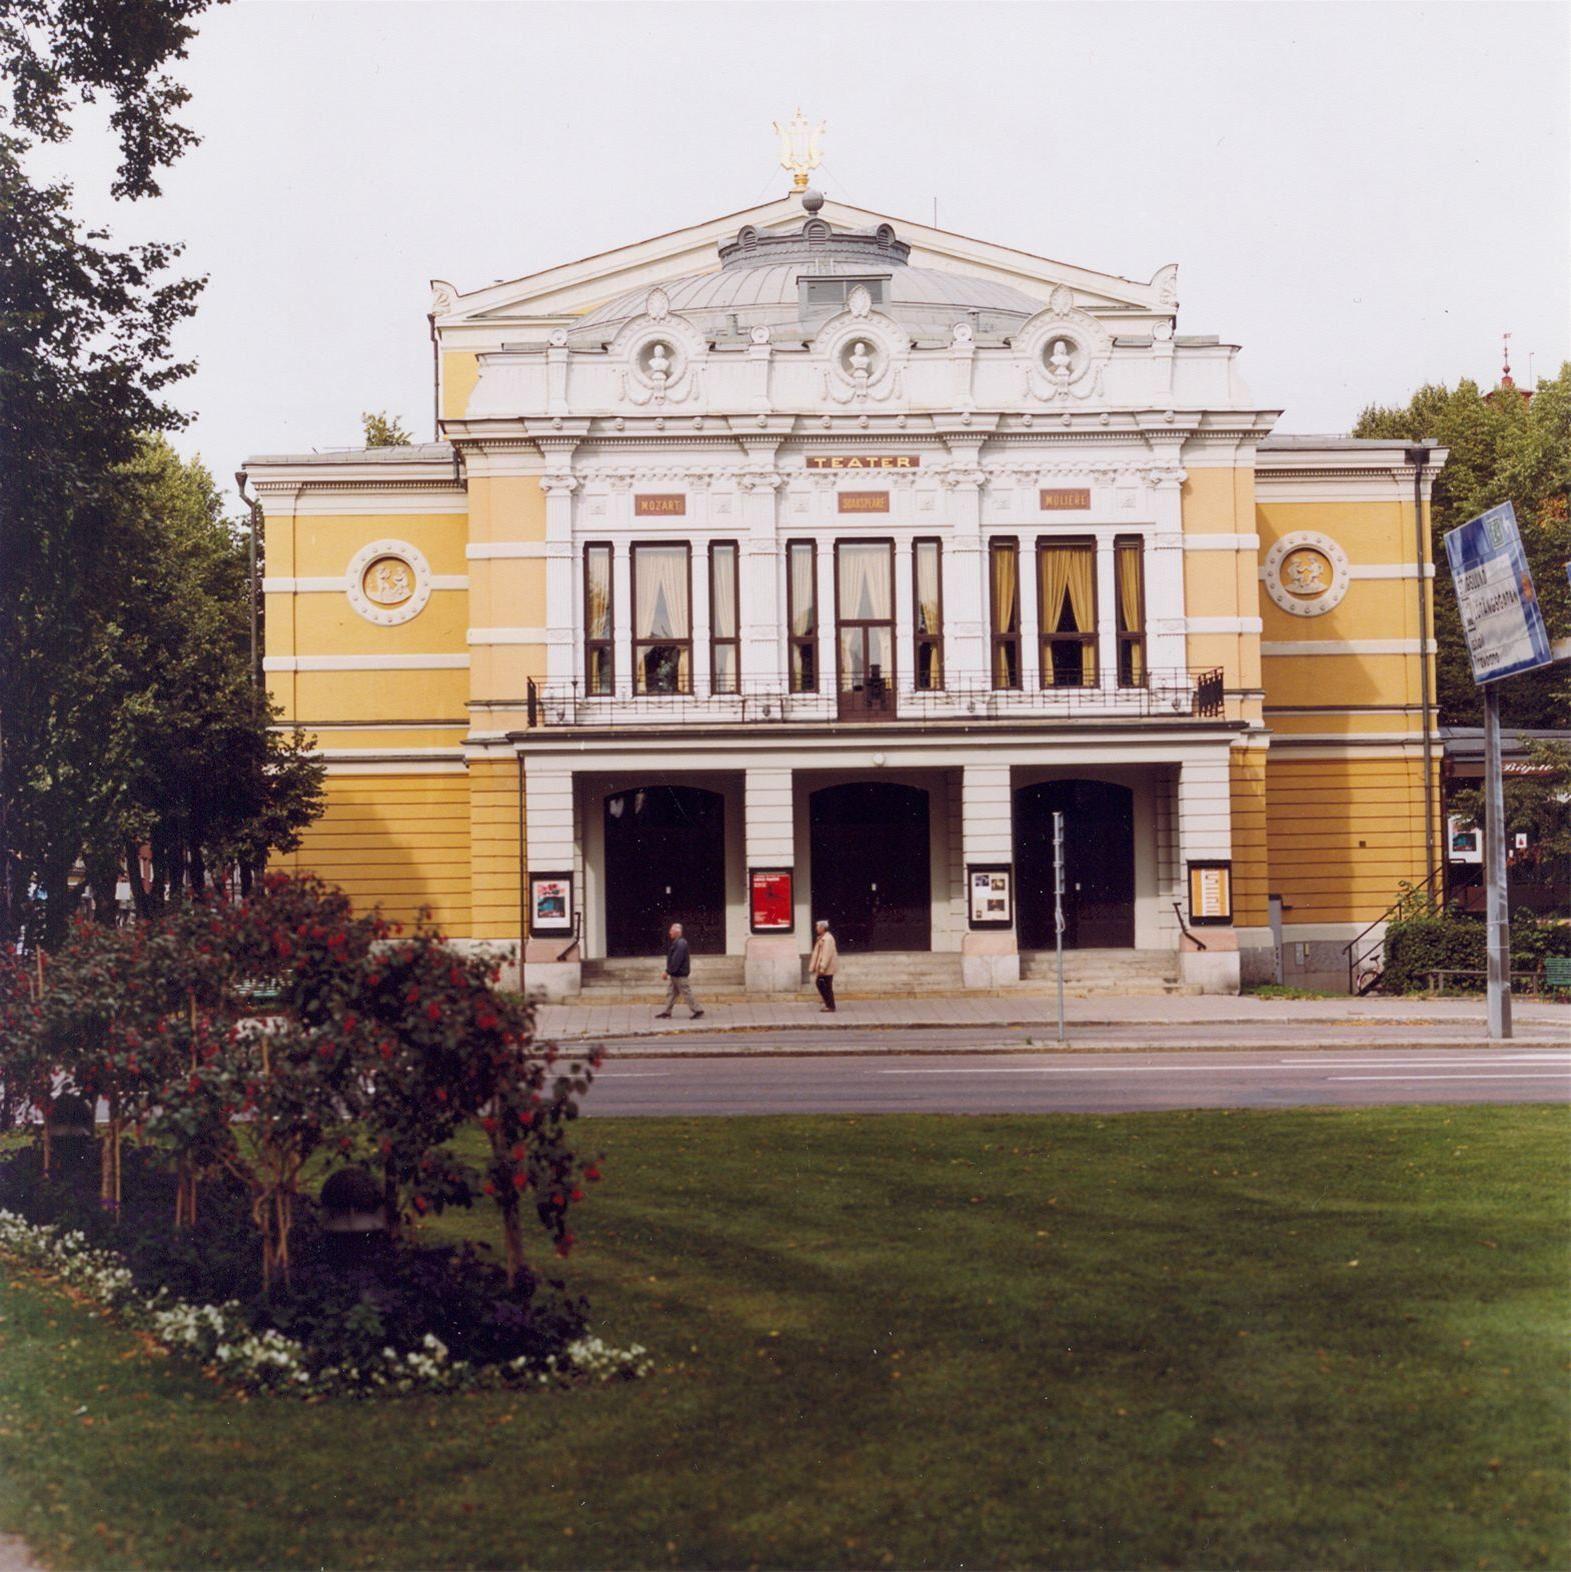 Gävle Teater